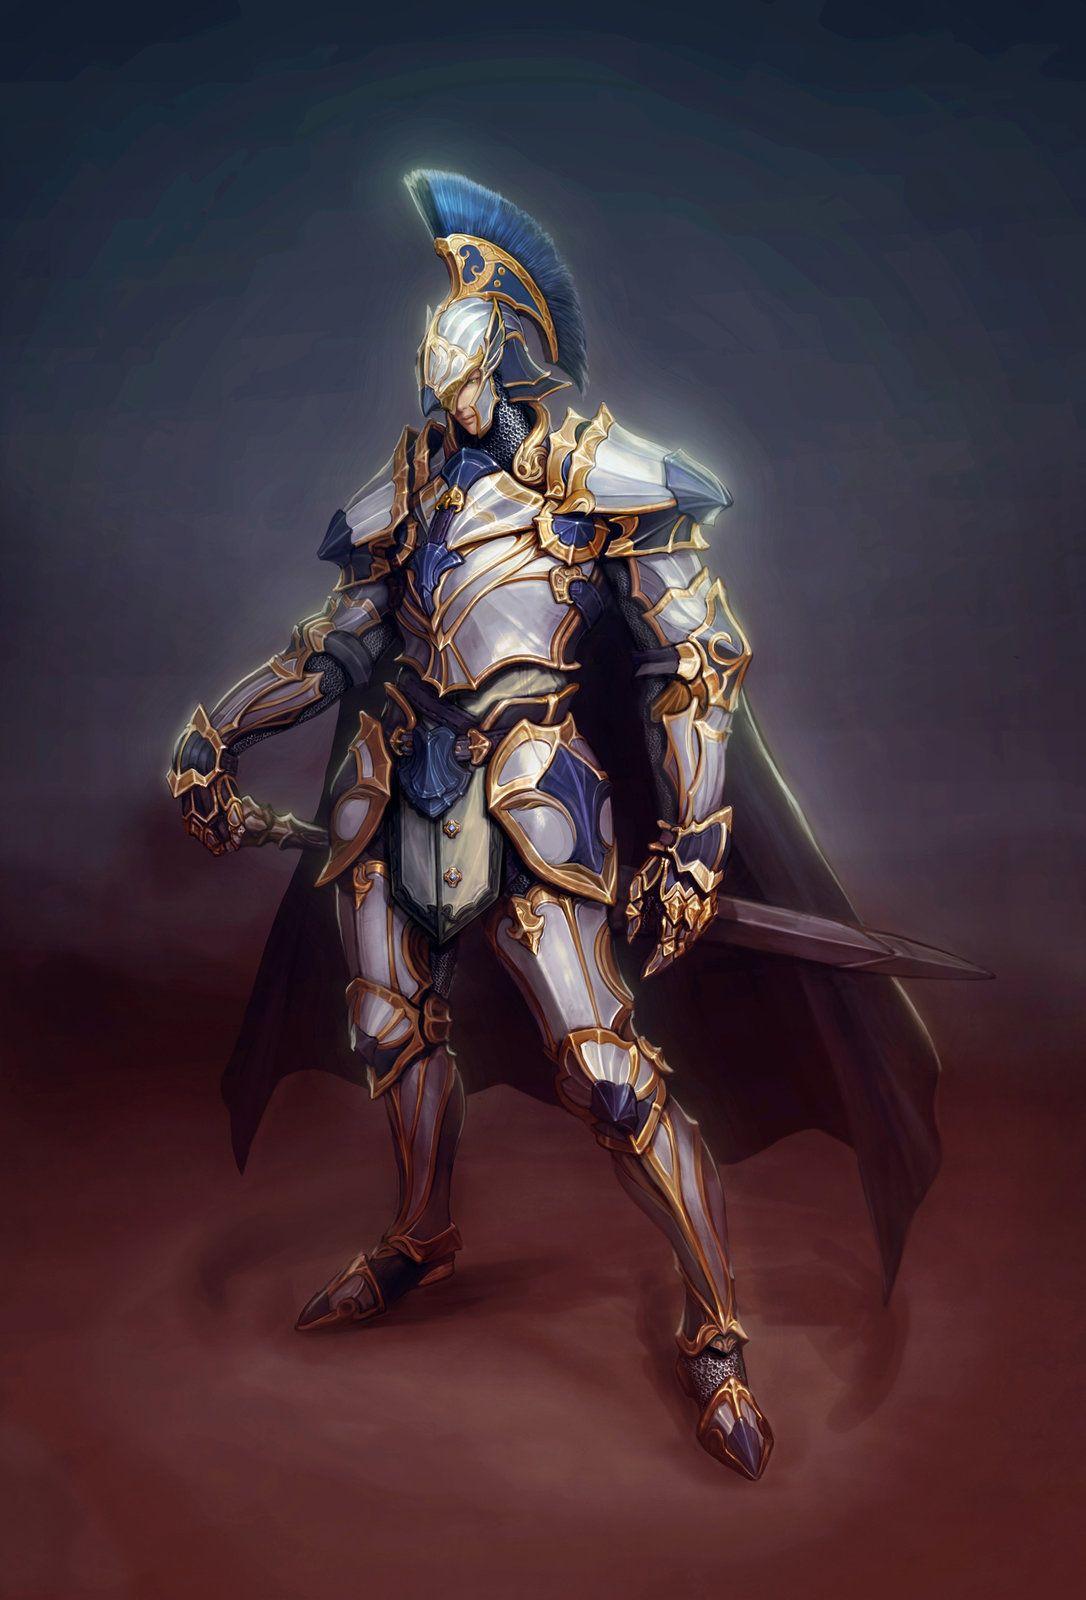 White knight, 보연 원 on ArtStation at https://artstation.com ...